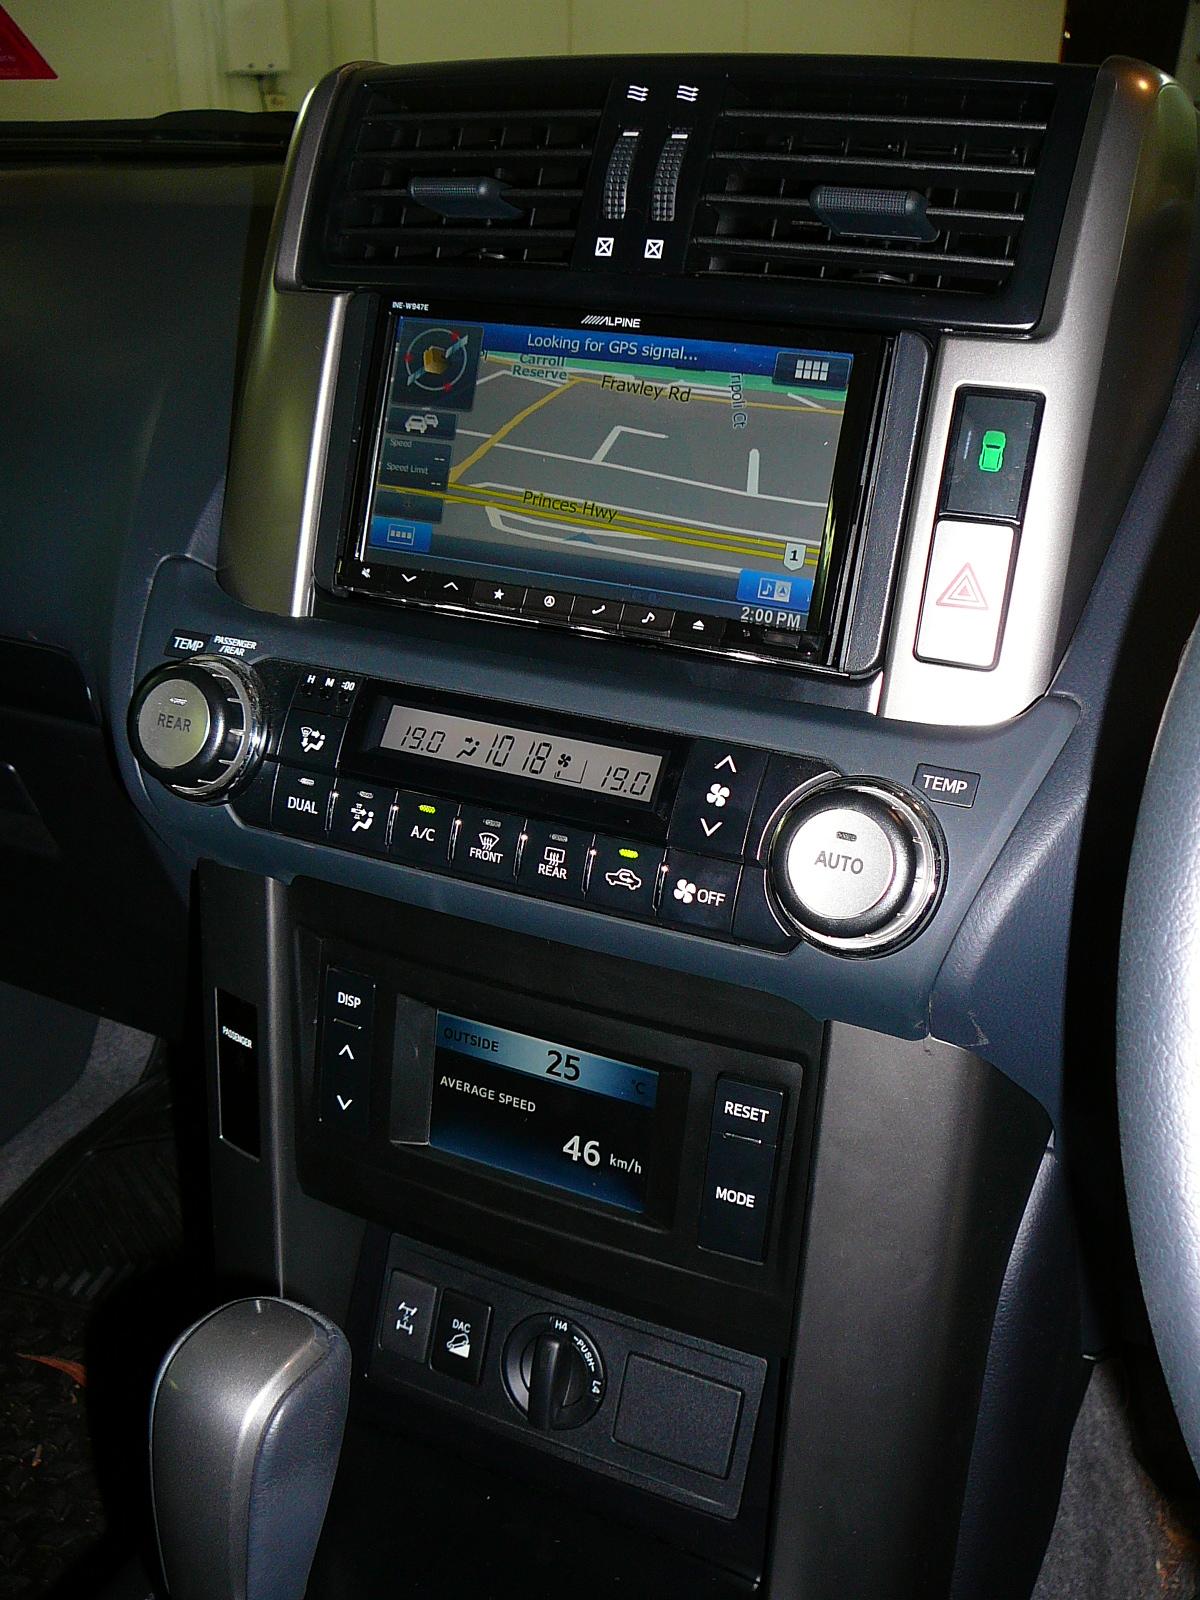 Toyota Prado 150 series, Alpine Navigation and relocation of